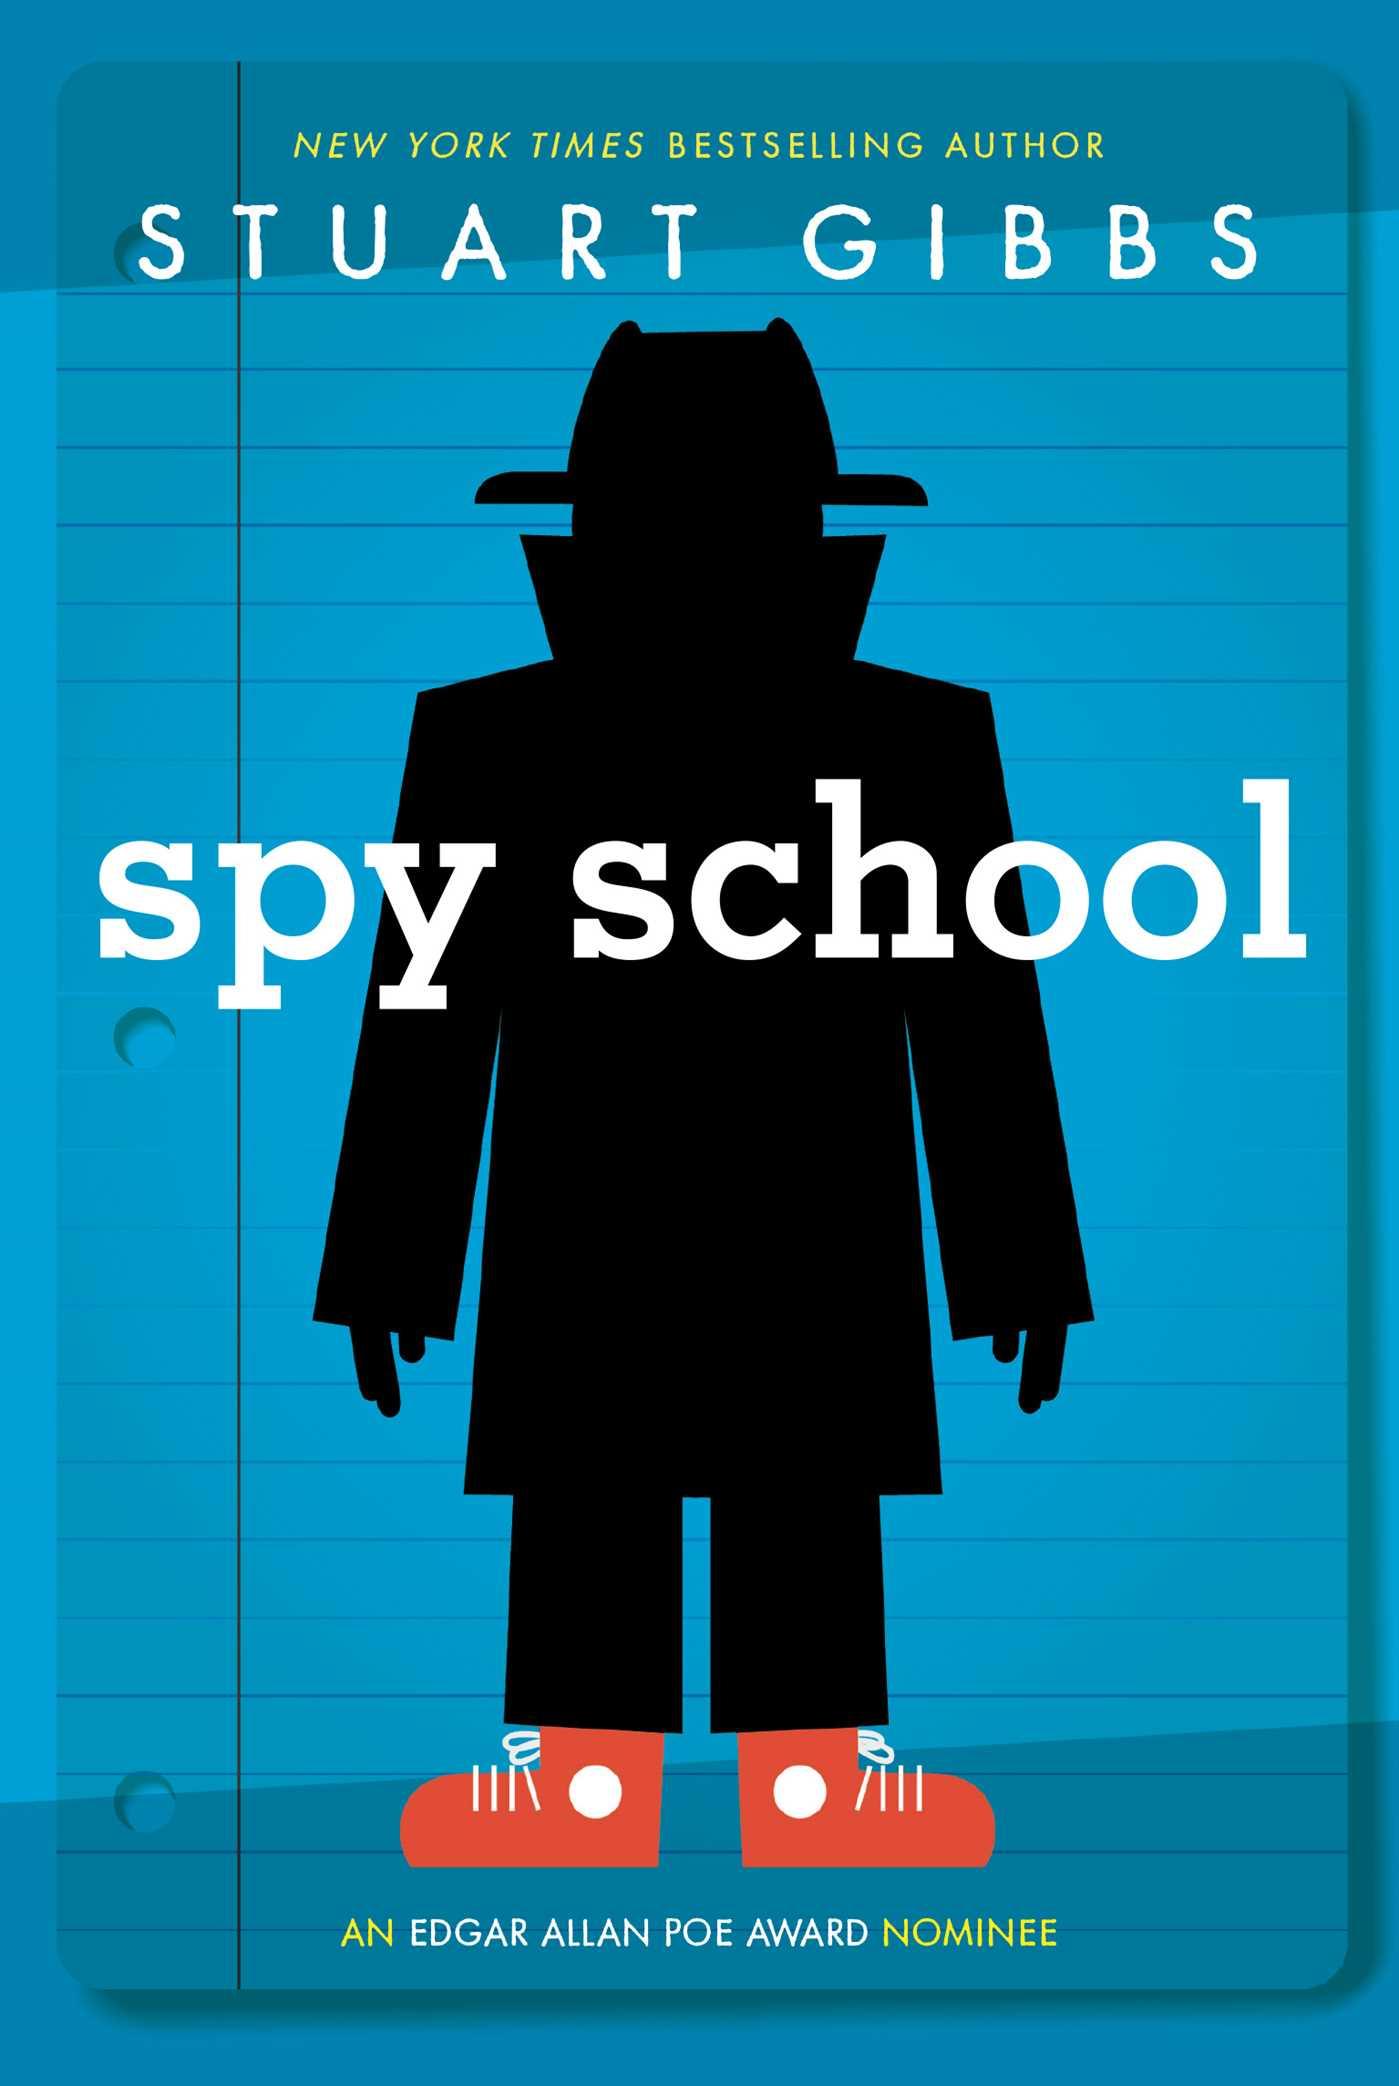 Spy school 9781442421837 hr